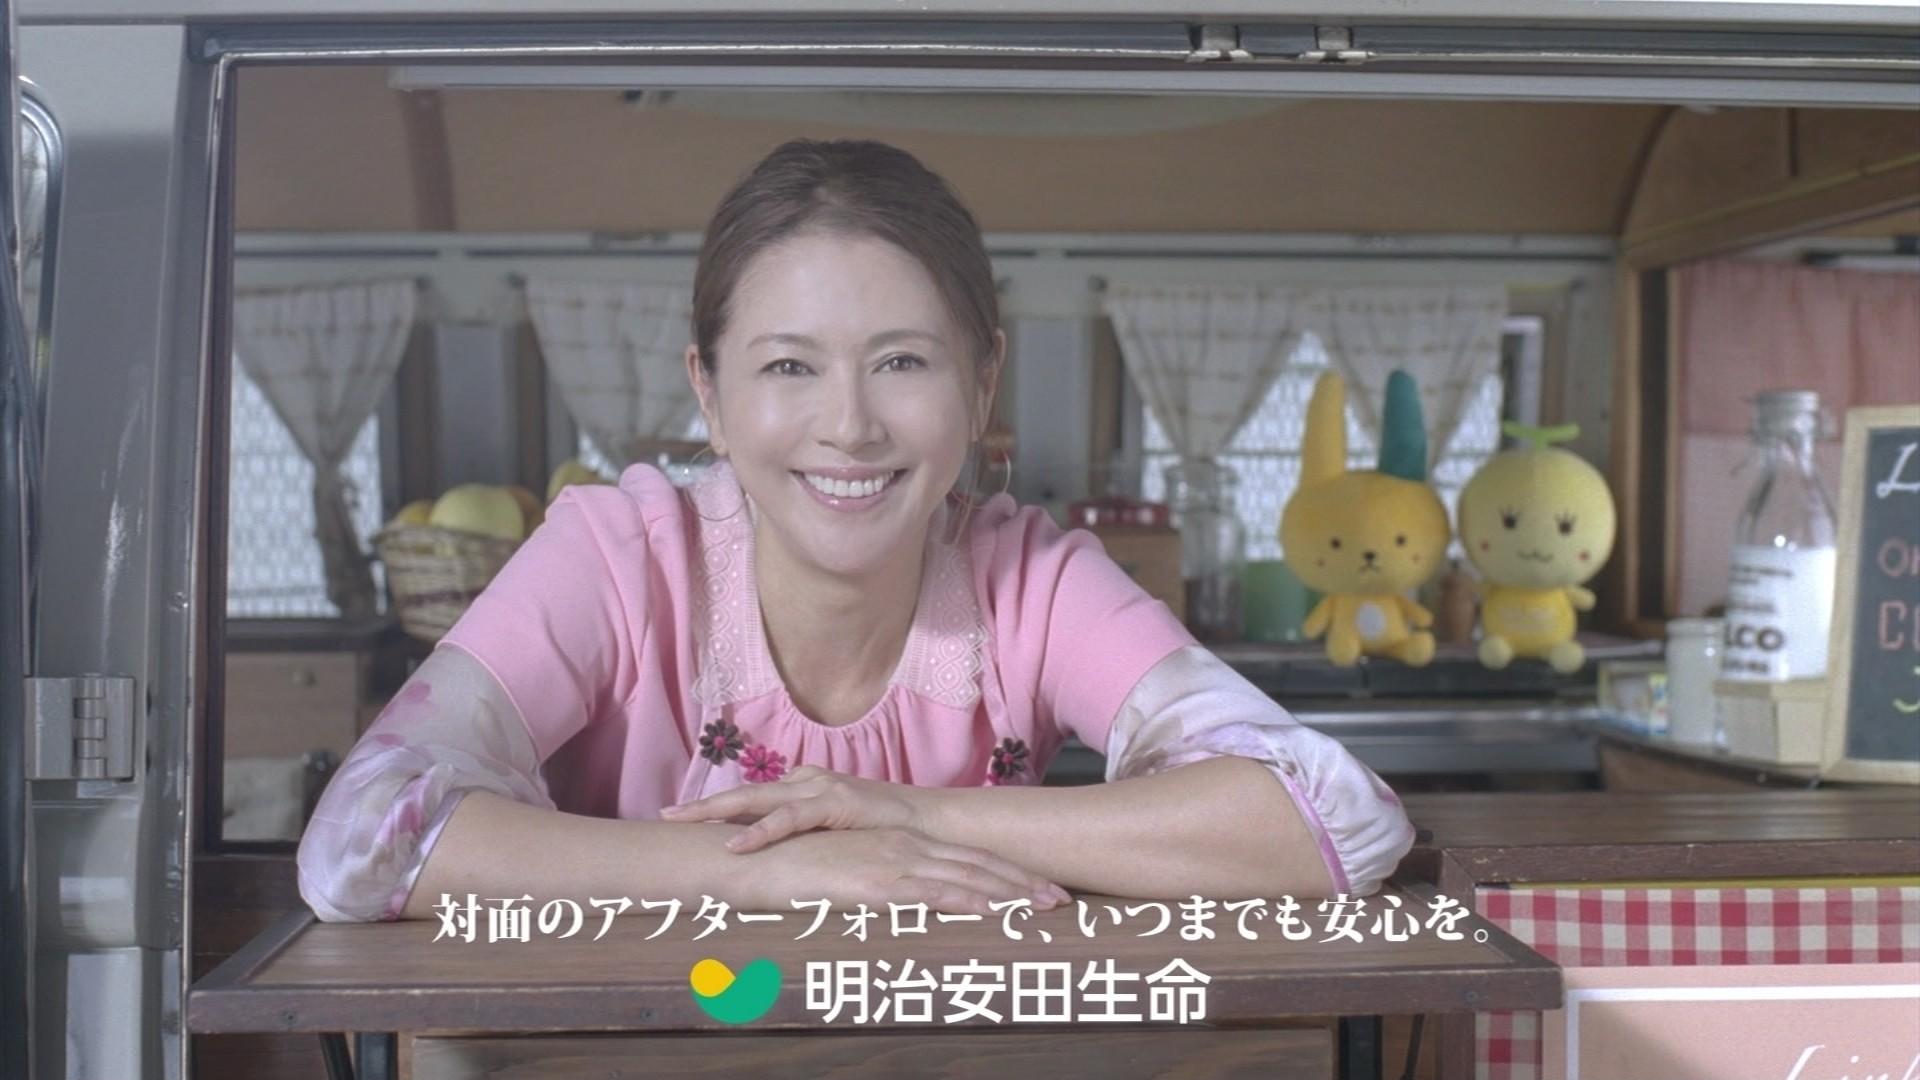 .imagetwist.com   yukikax 23